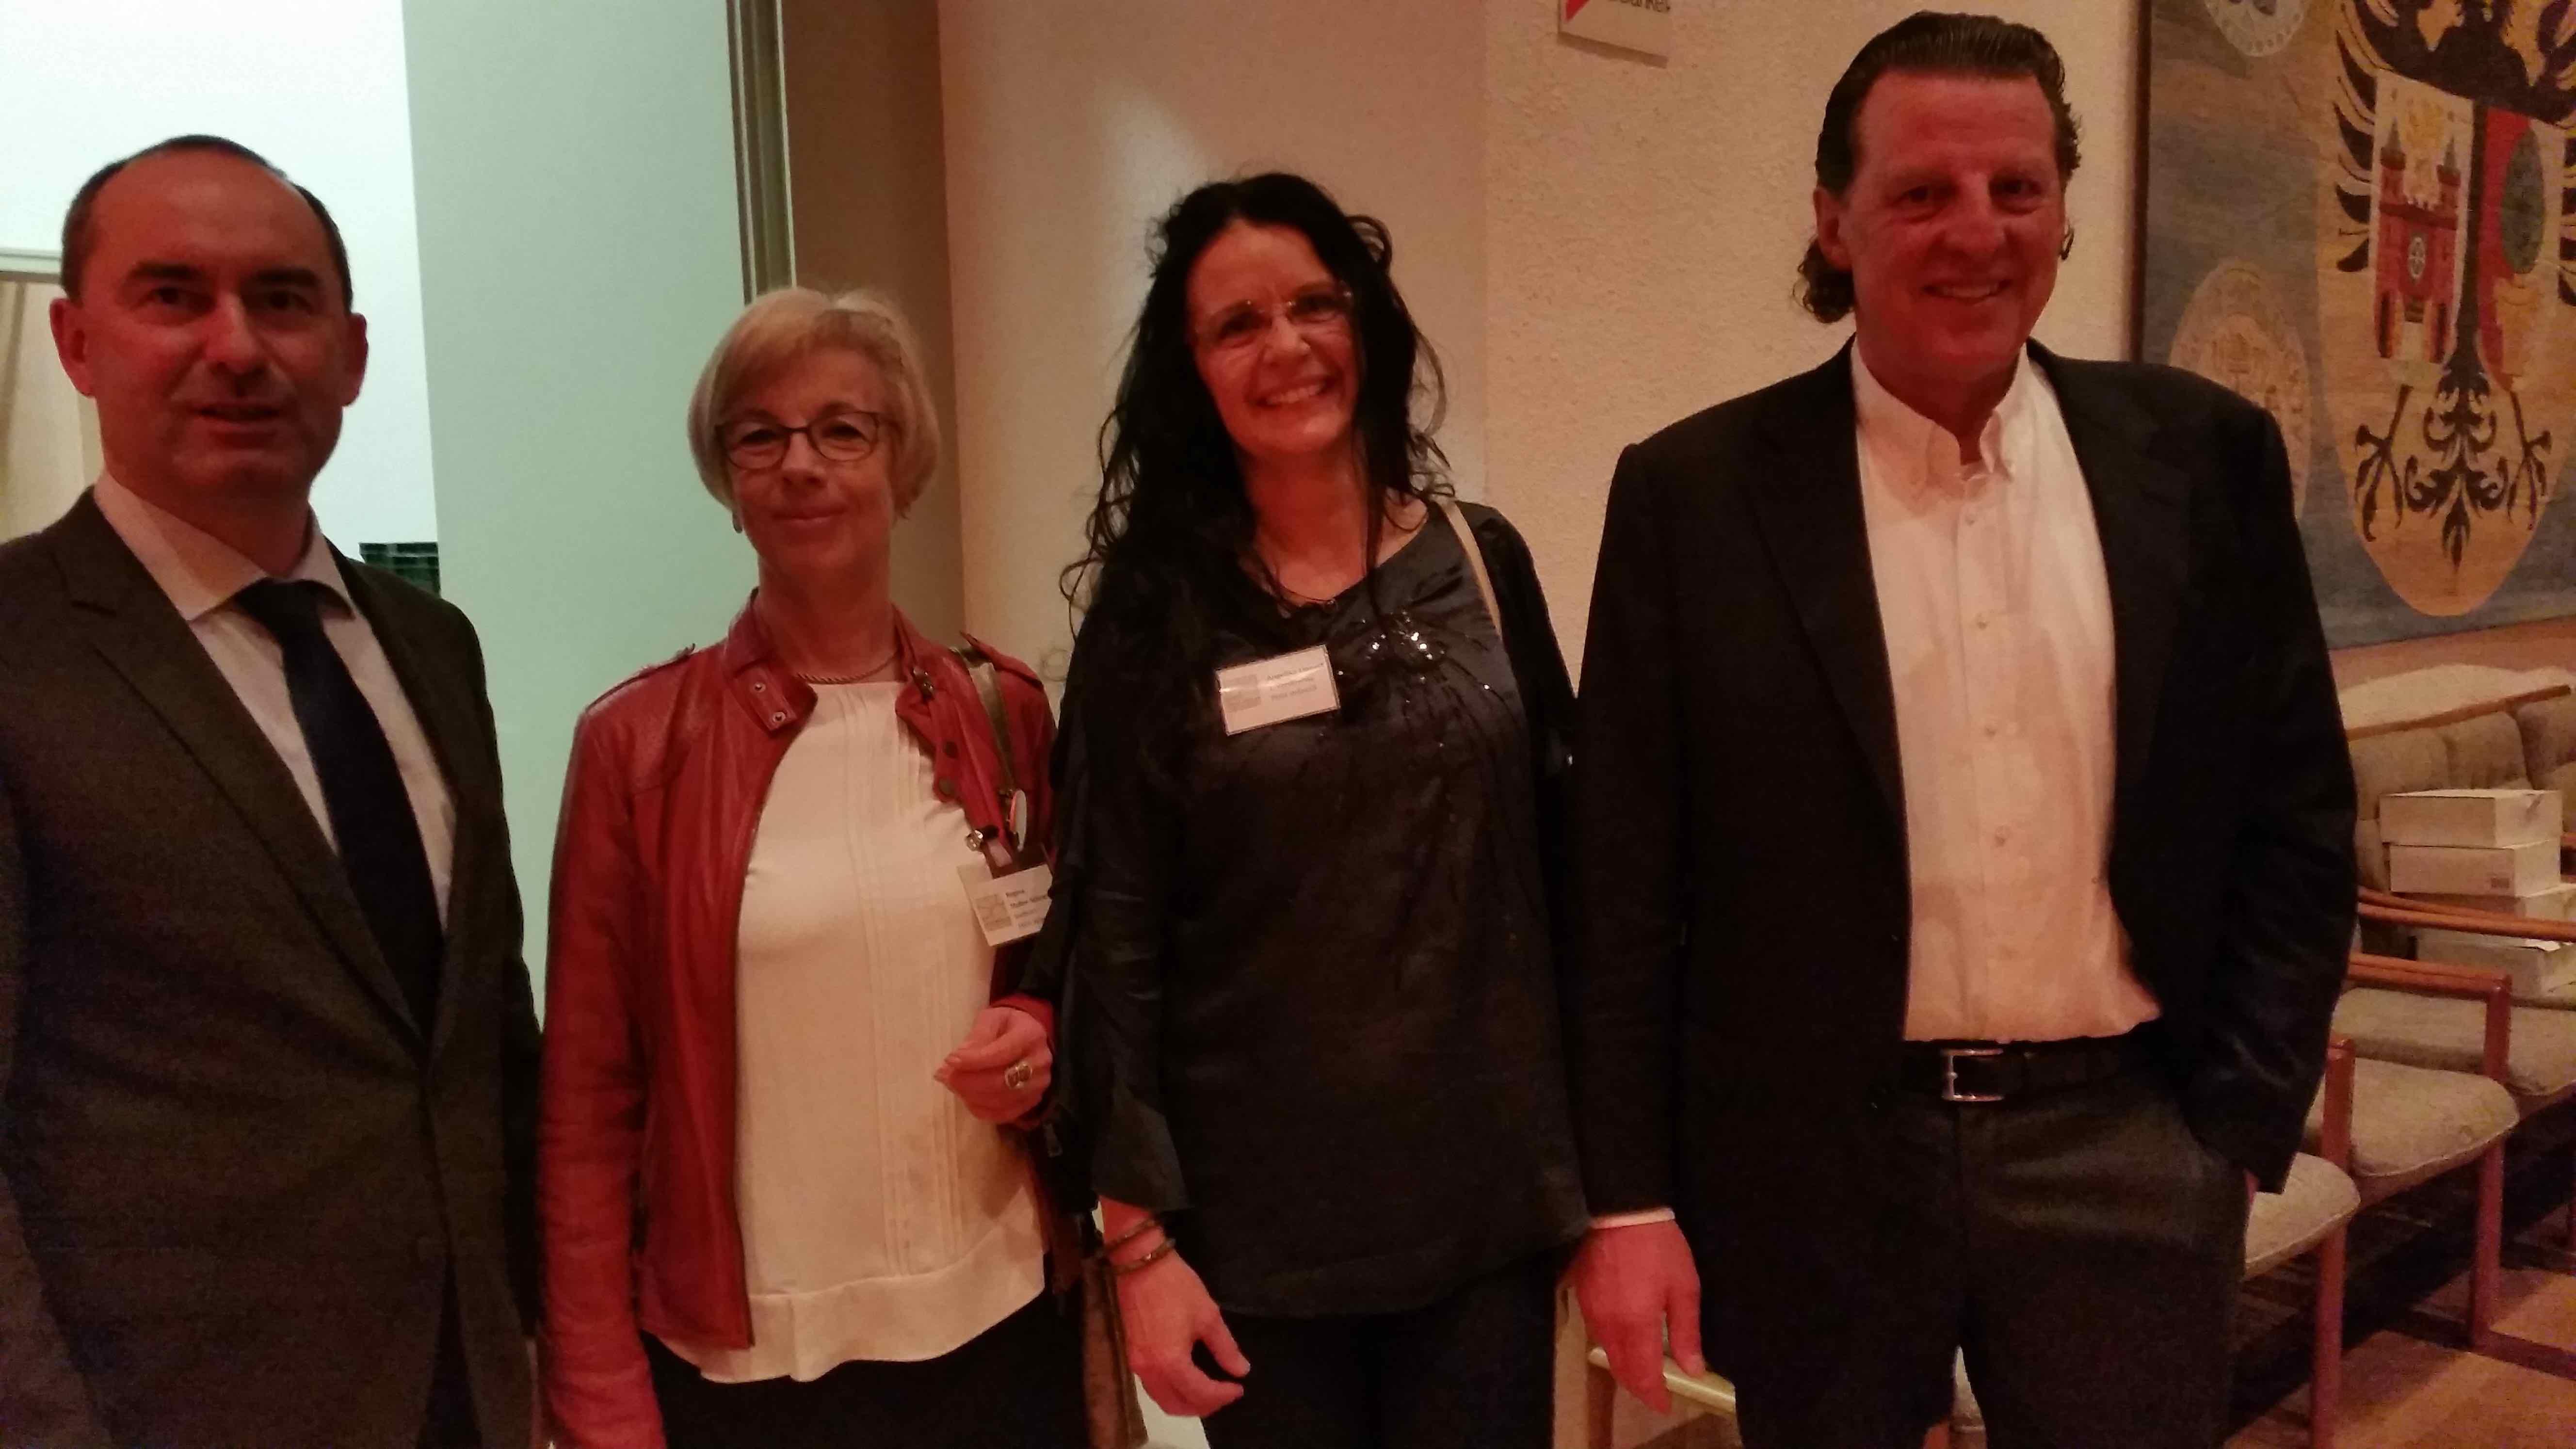 Hubert Aiwanger, Regina Stuber-Schneider, Angelika Lipp.ert, Volker Schafitel (v.l) Foto: (c) DAZ